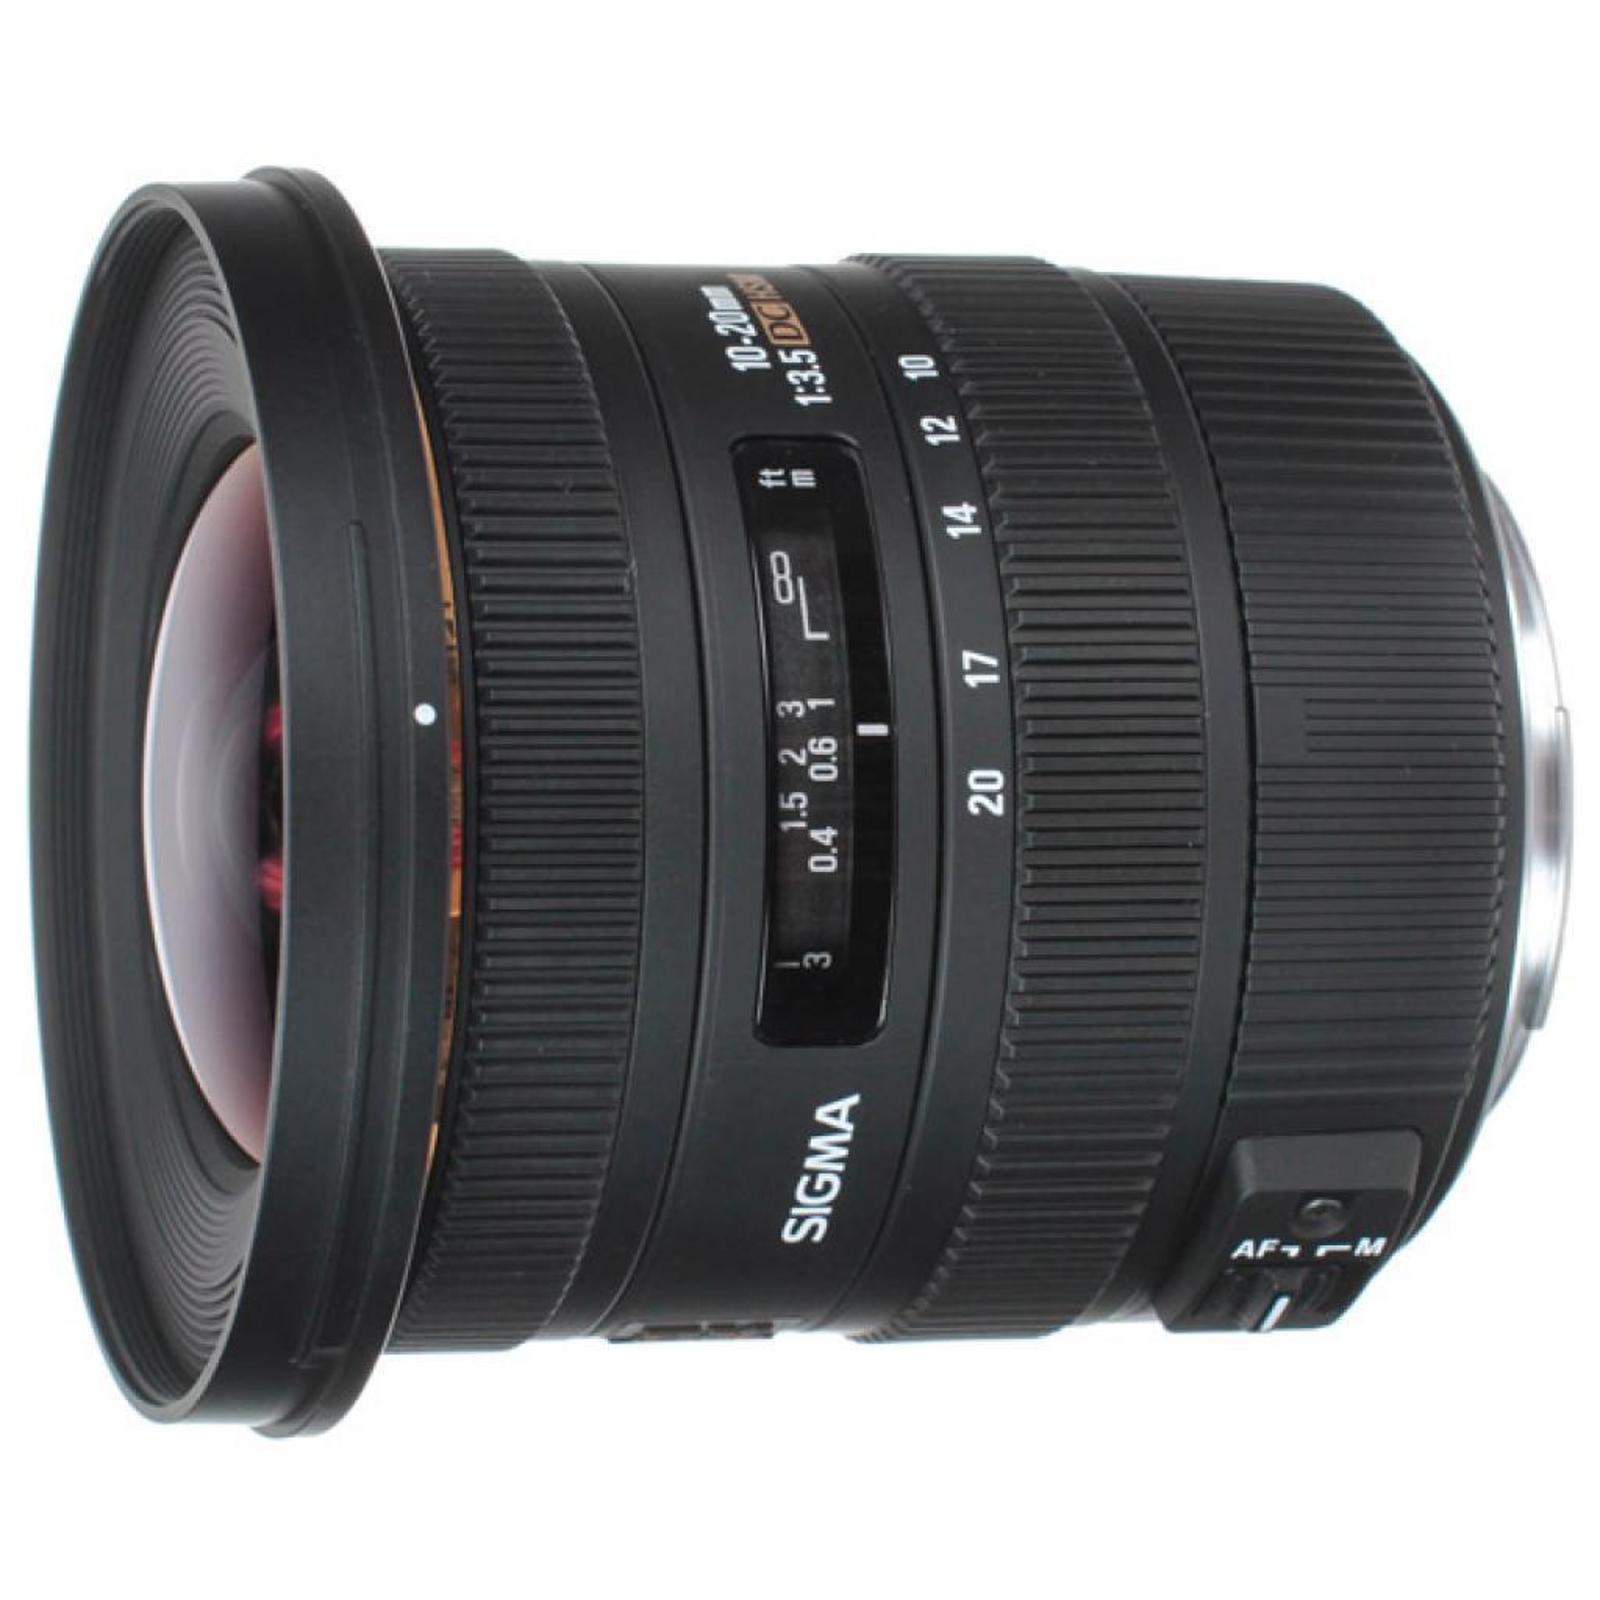 Объектив Sigma 10-20mm/3.5 EX DC HSM Canon (202954)